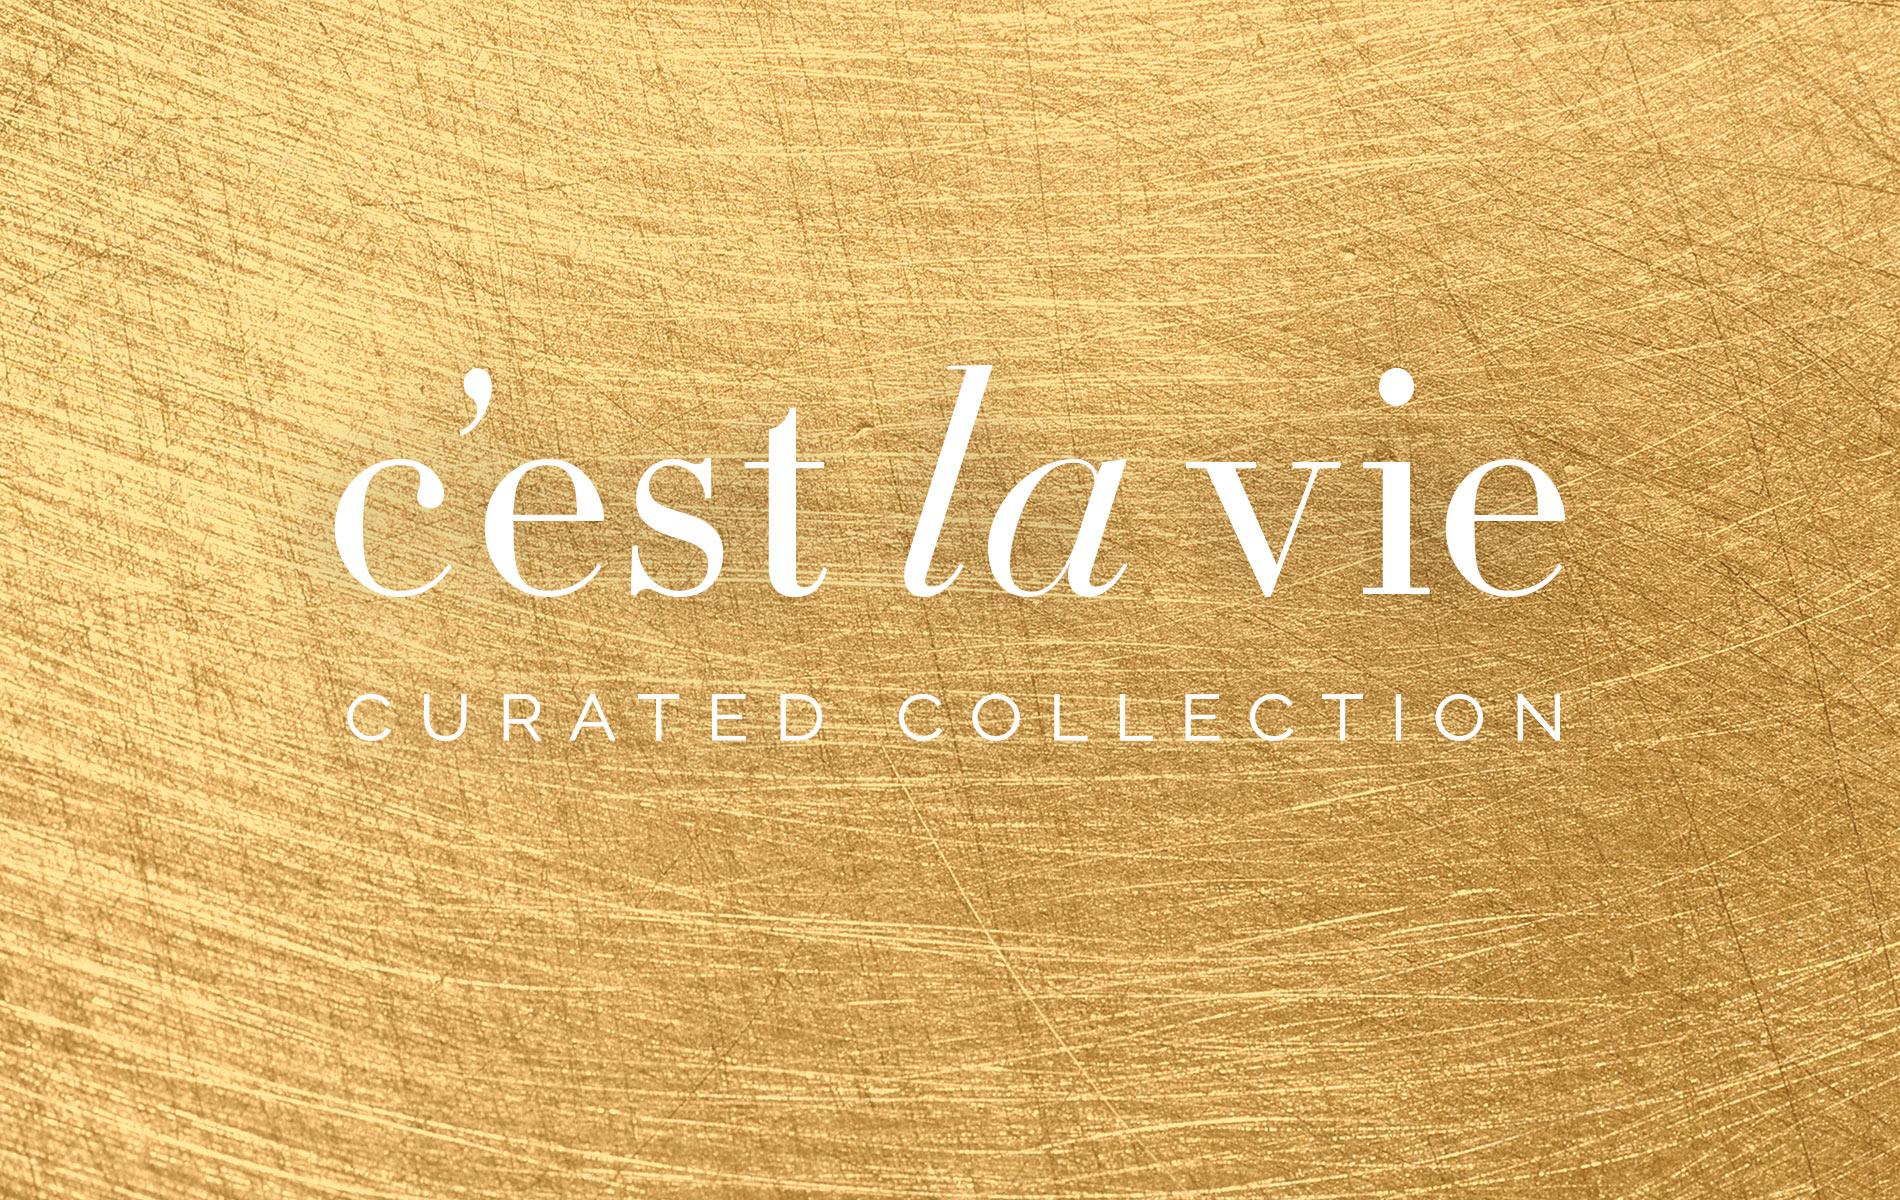 C'est la VIE curated collections